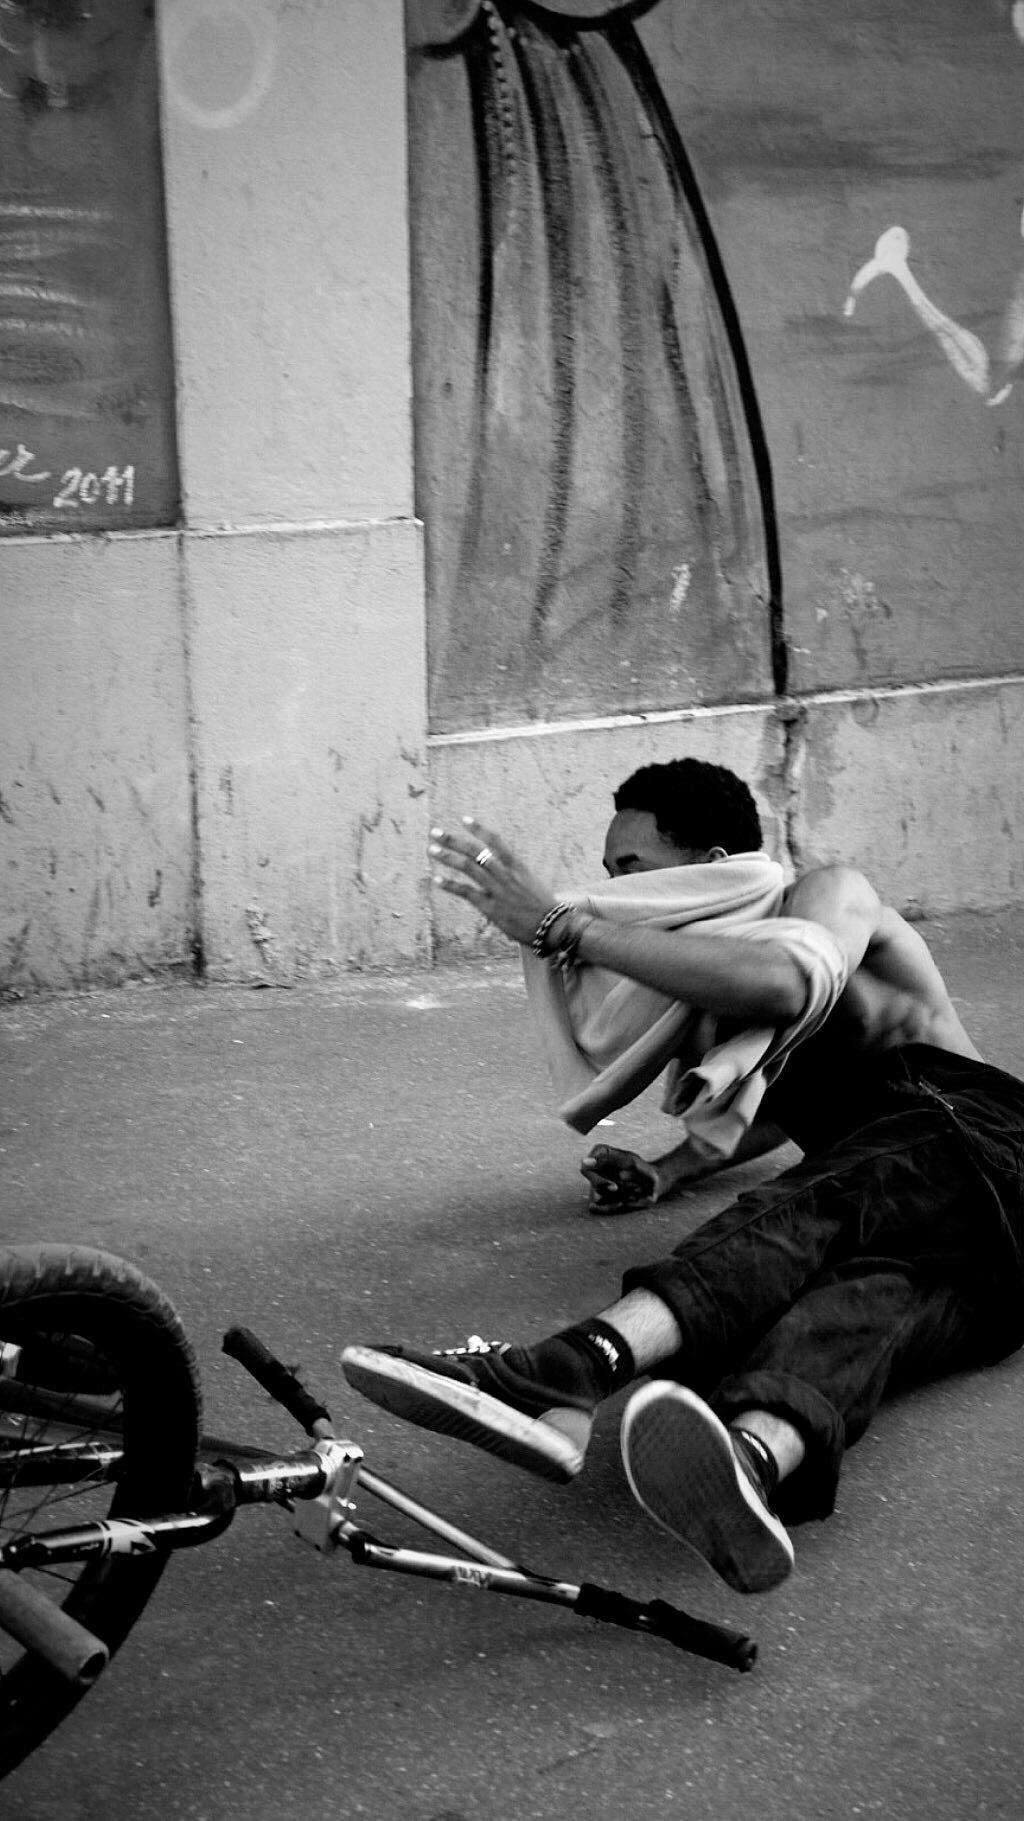 Superbe_media_urbain_paris_lifestyle_france_performance_bmx-7